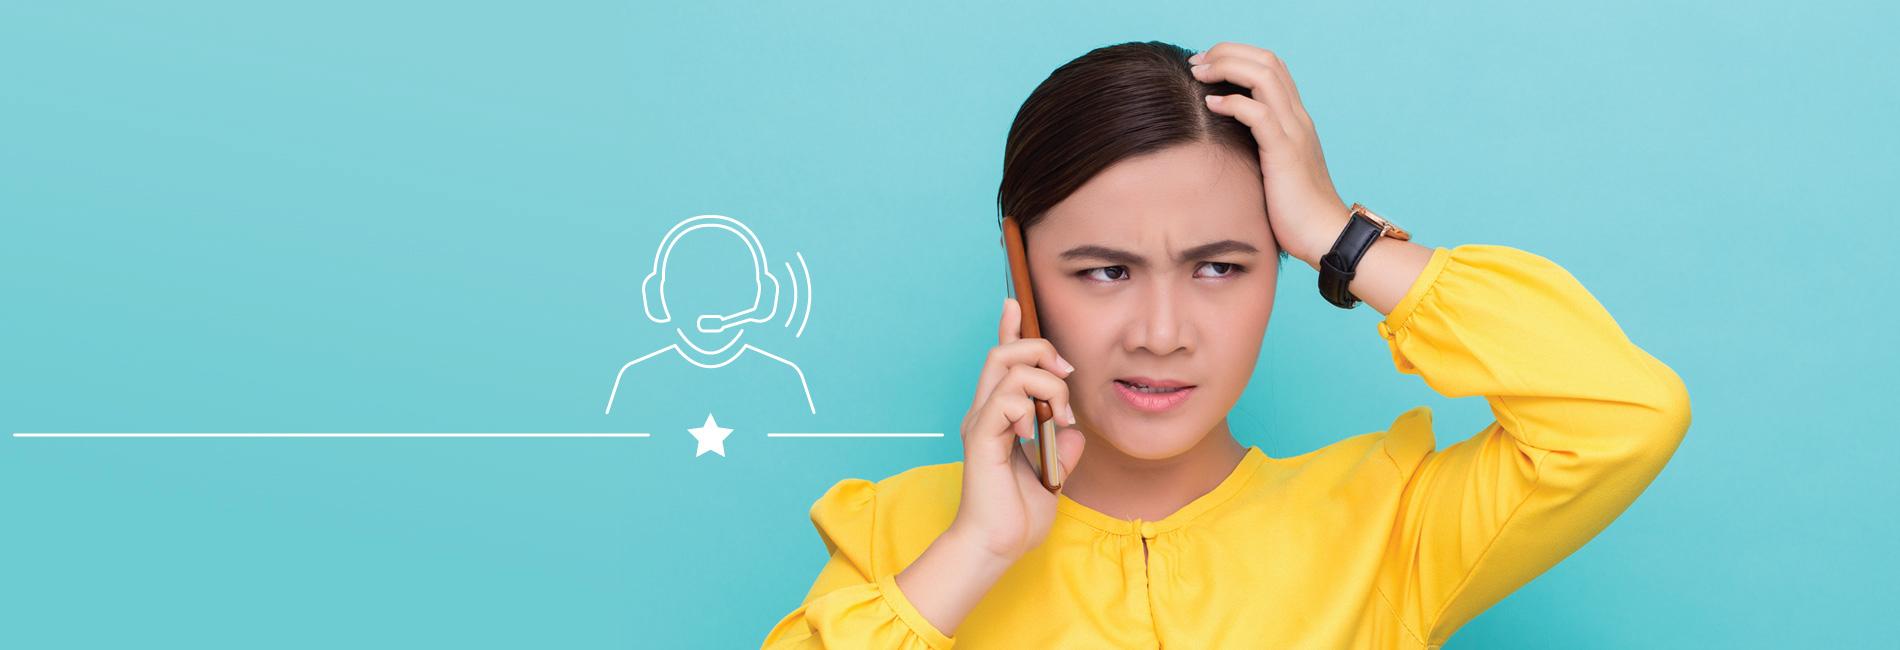 Behavioral Signals Quality Assurance